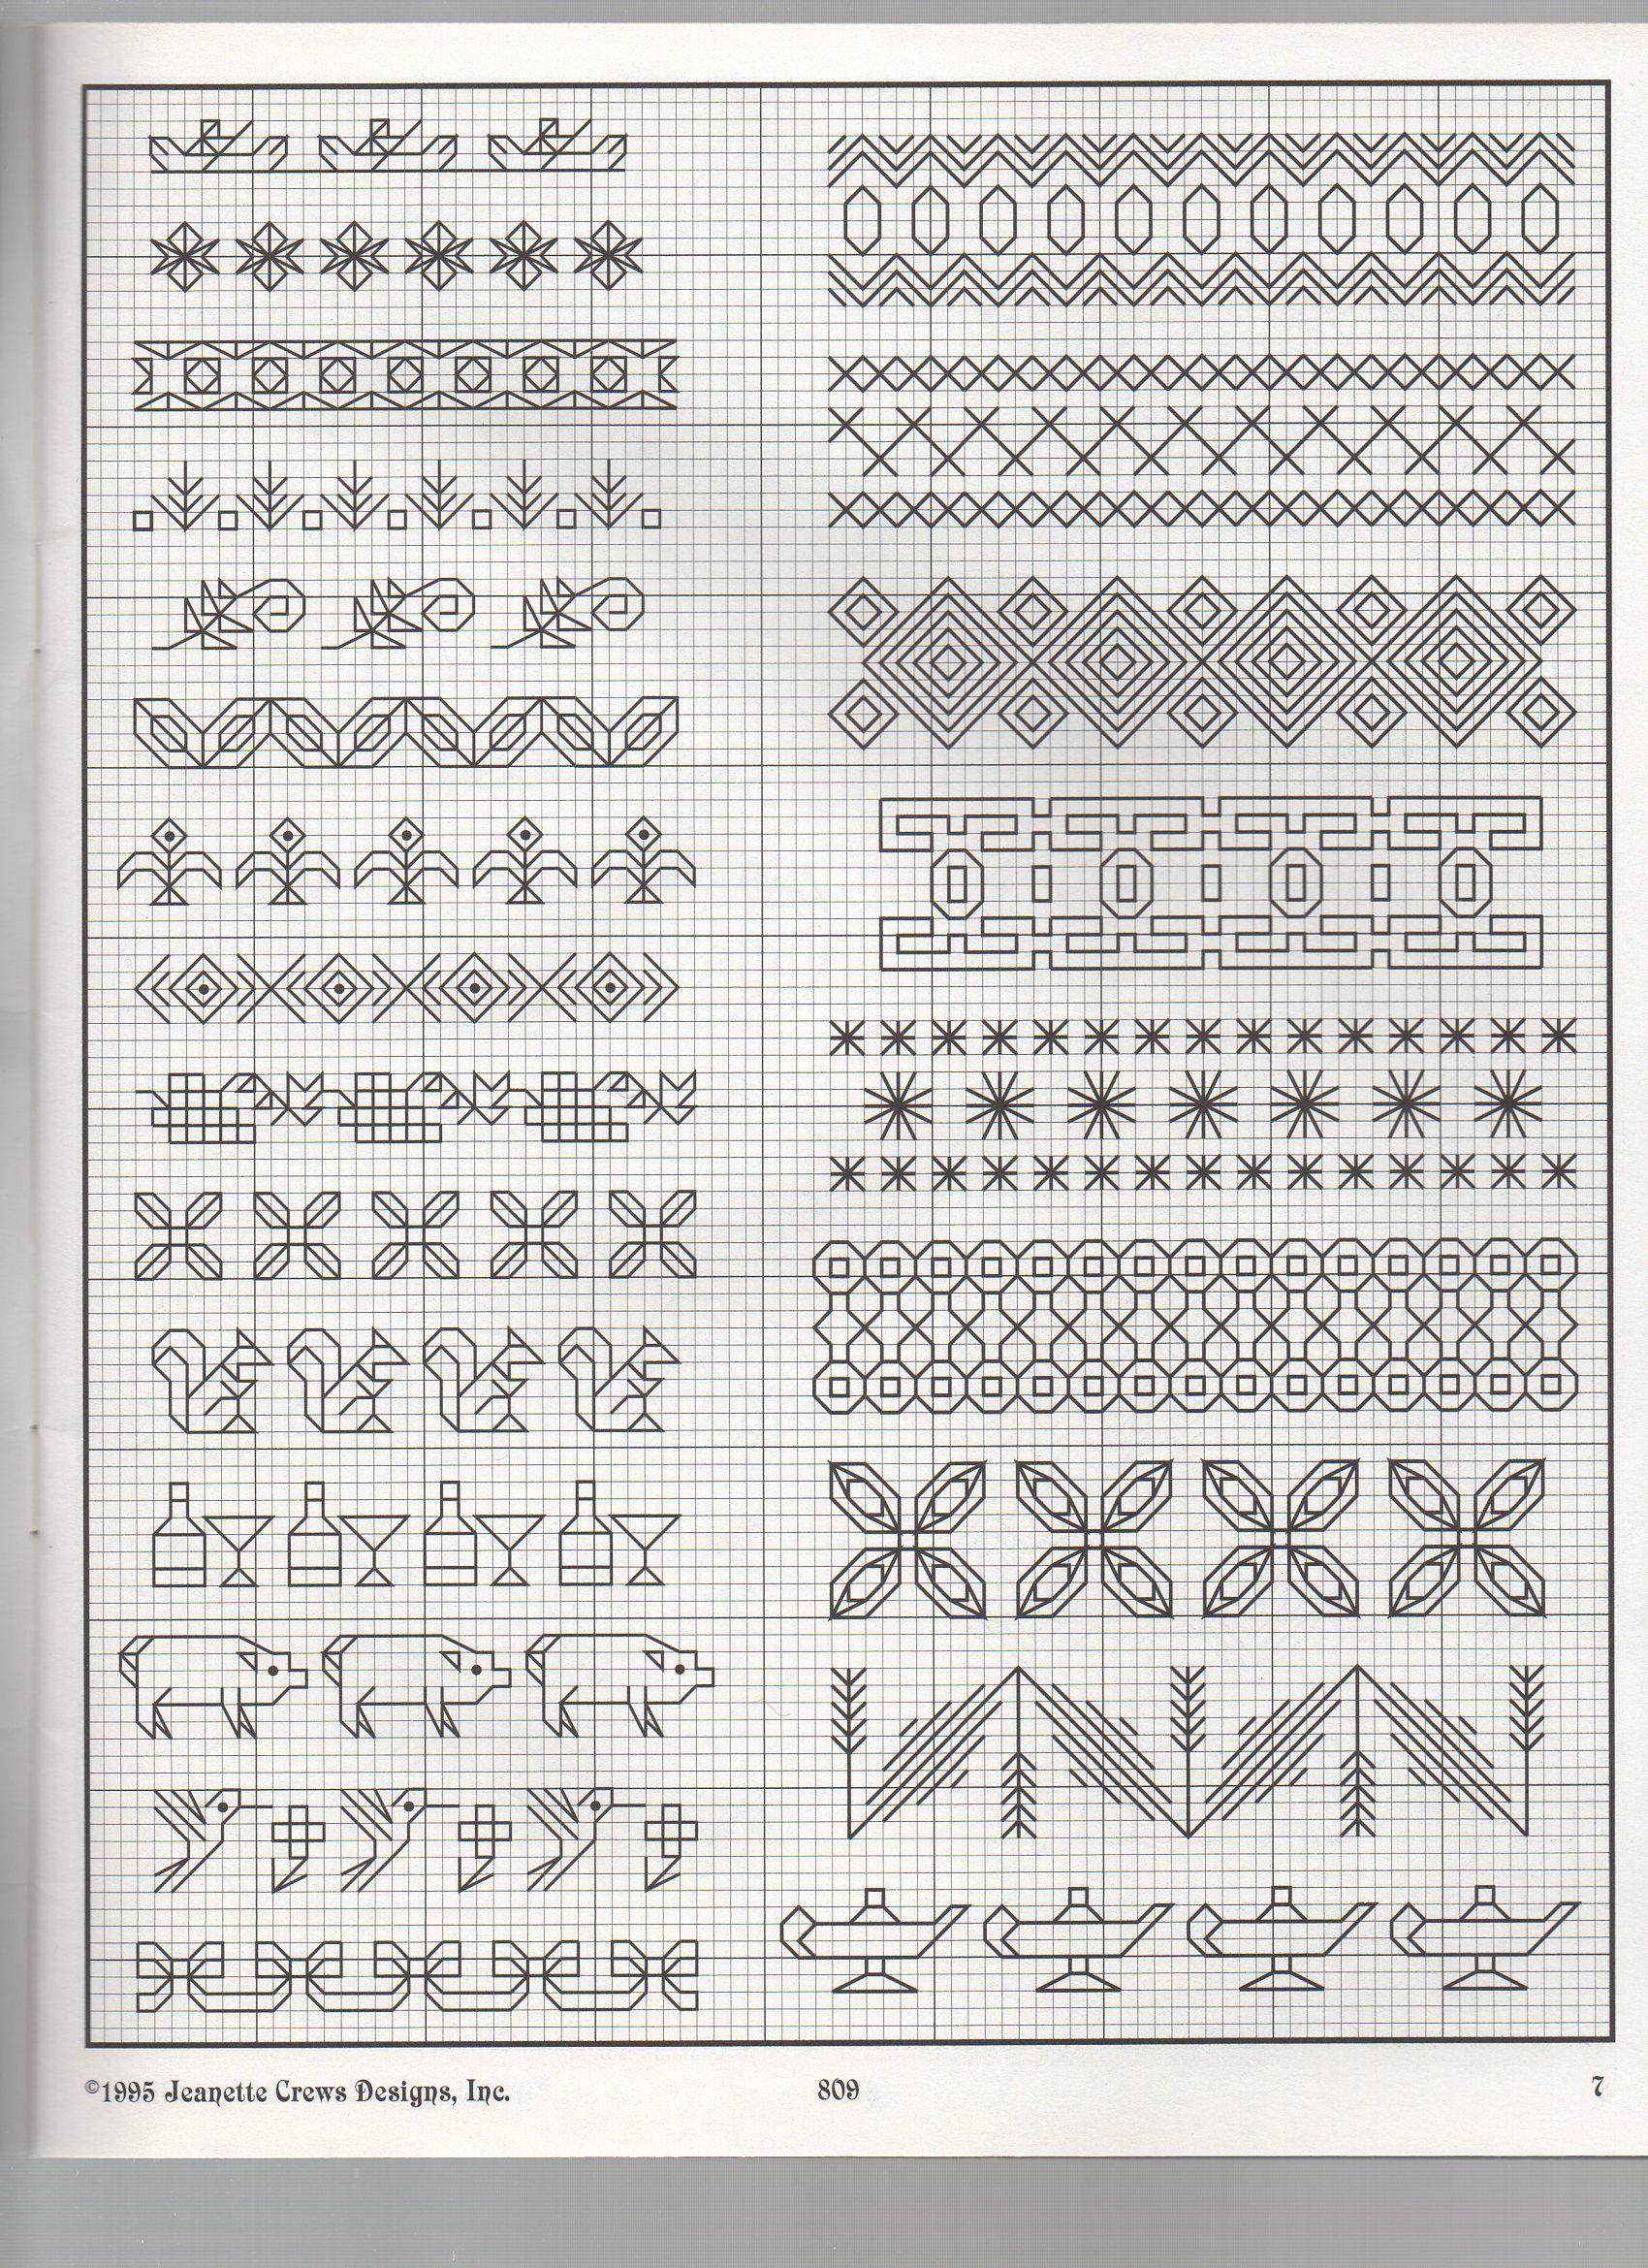 Back Stitch Embroidery On Knitting : BACKSTITCH BORDERS Black work Pinterest Blackwork, Cross stitch and Stitch